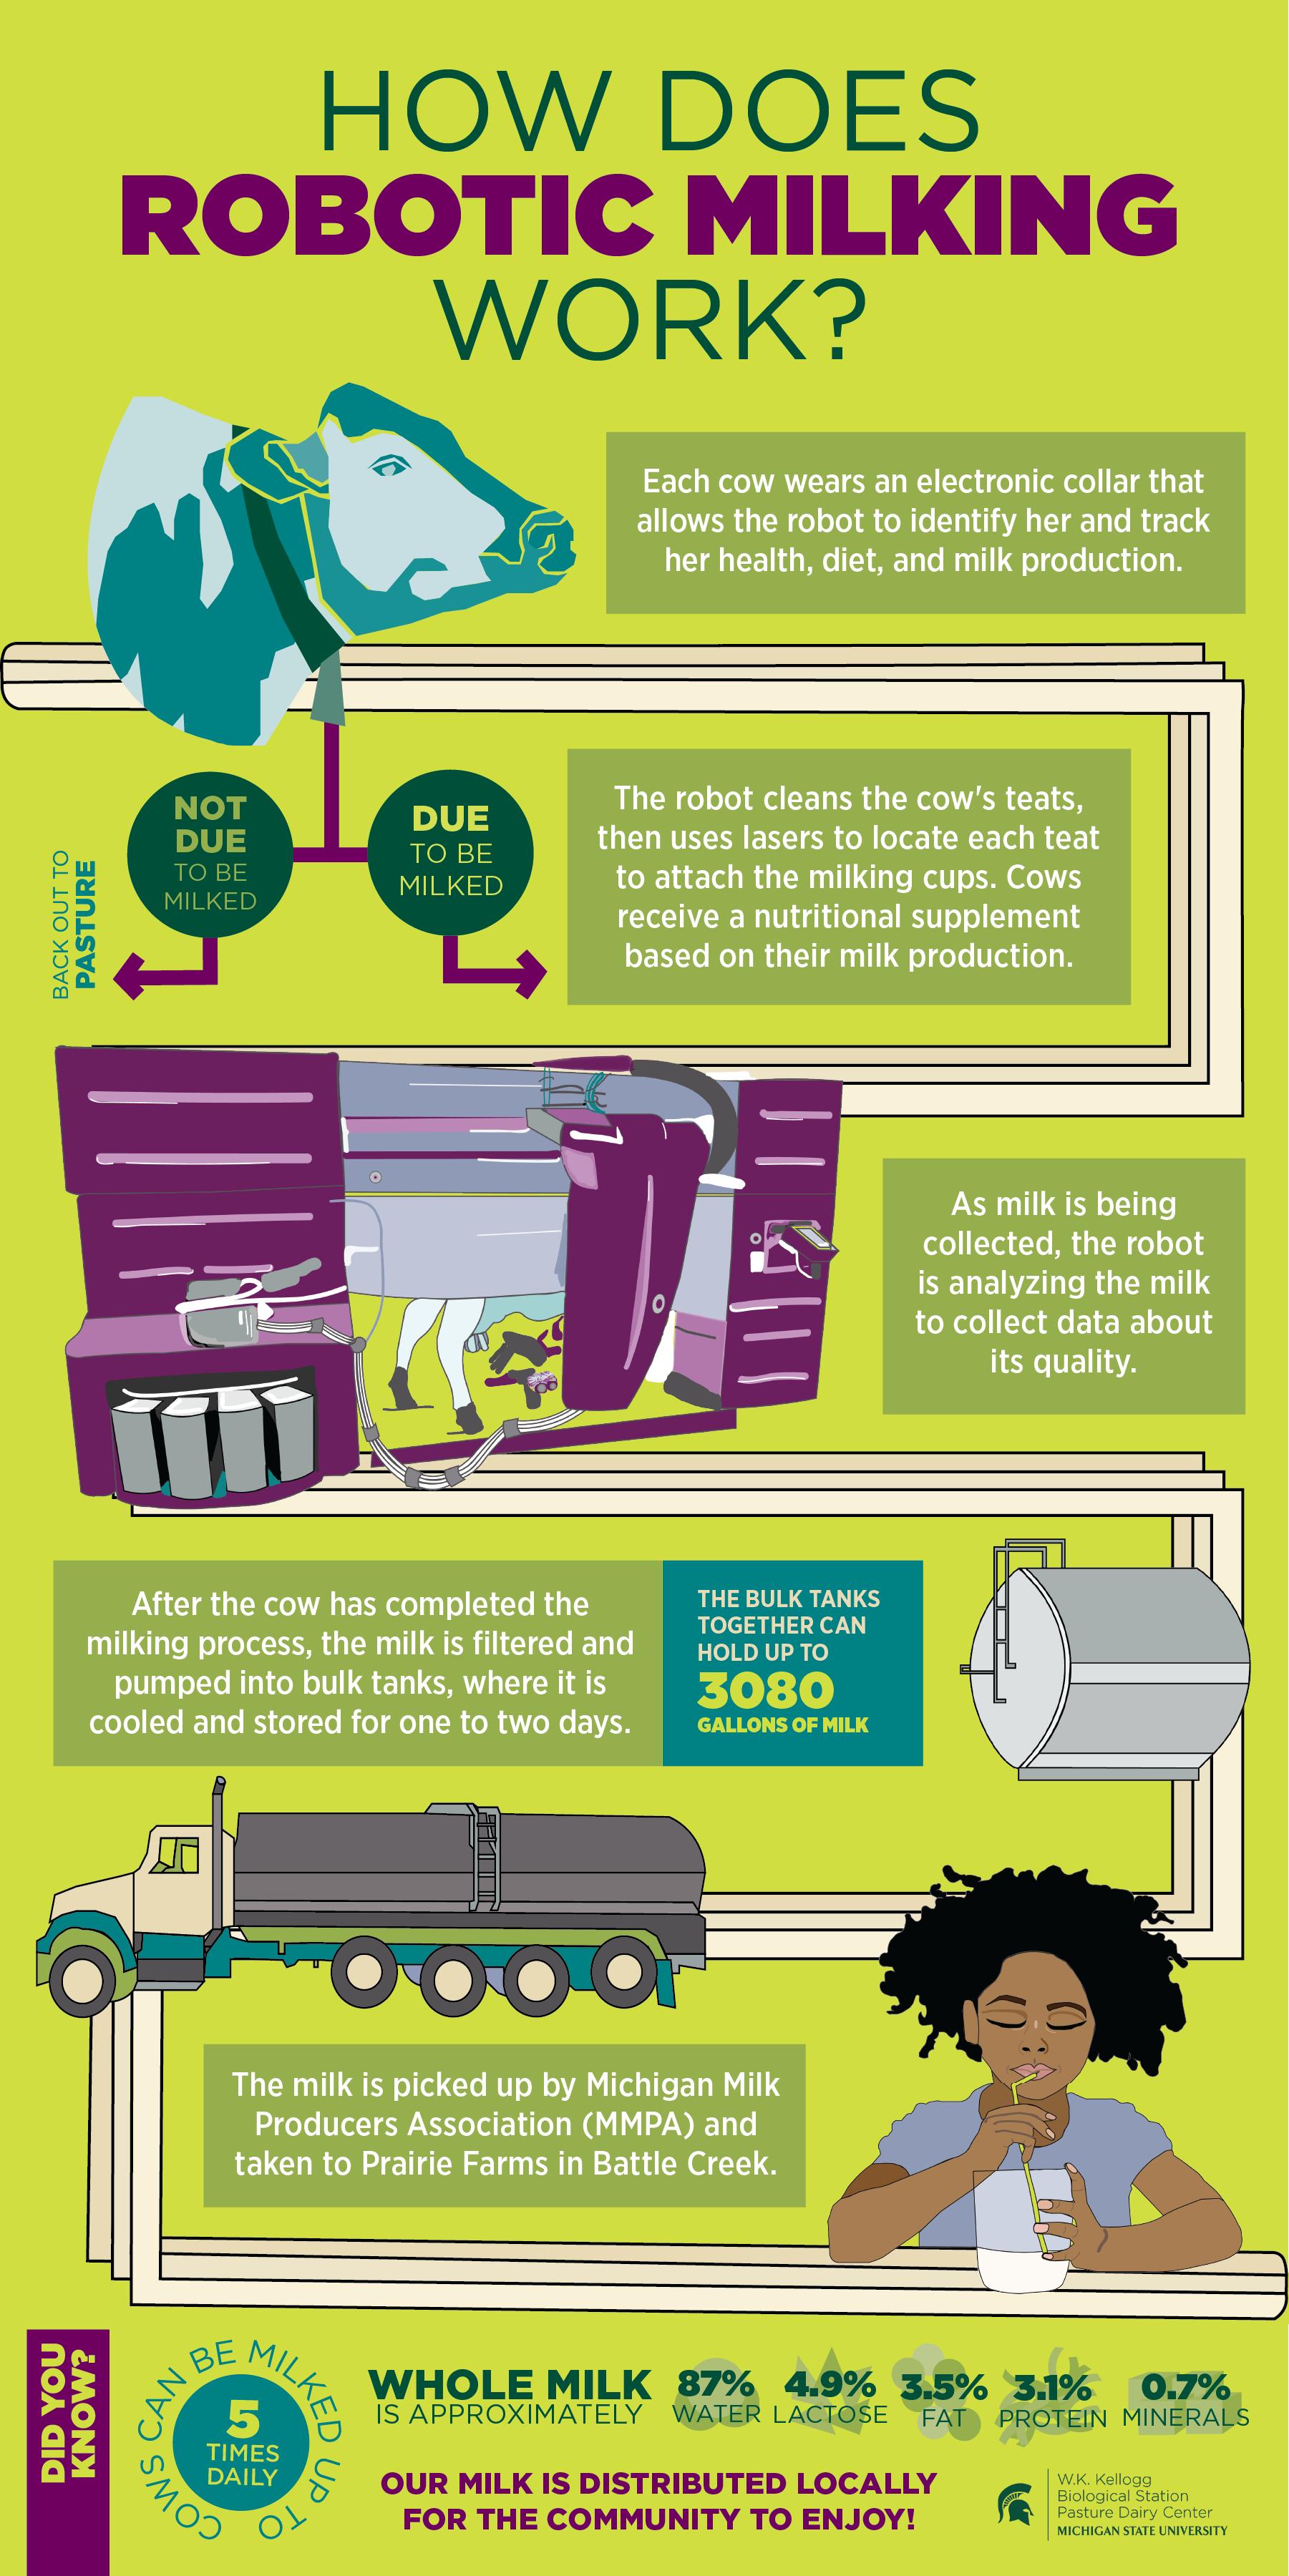 The Robotic Milking Process